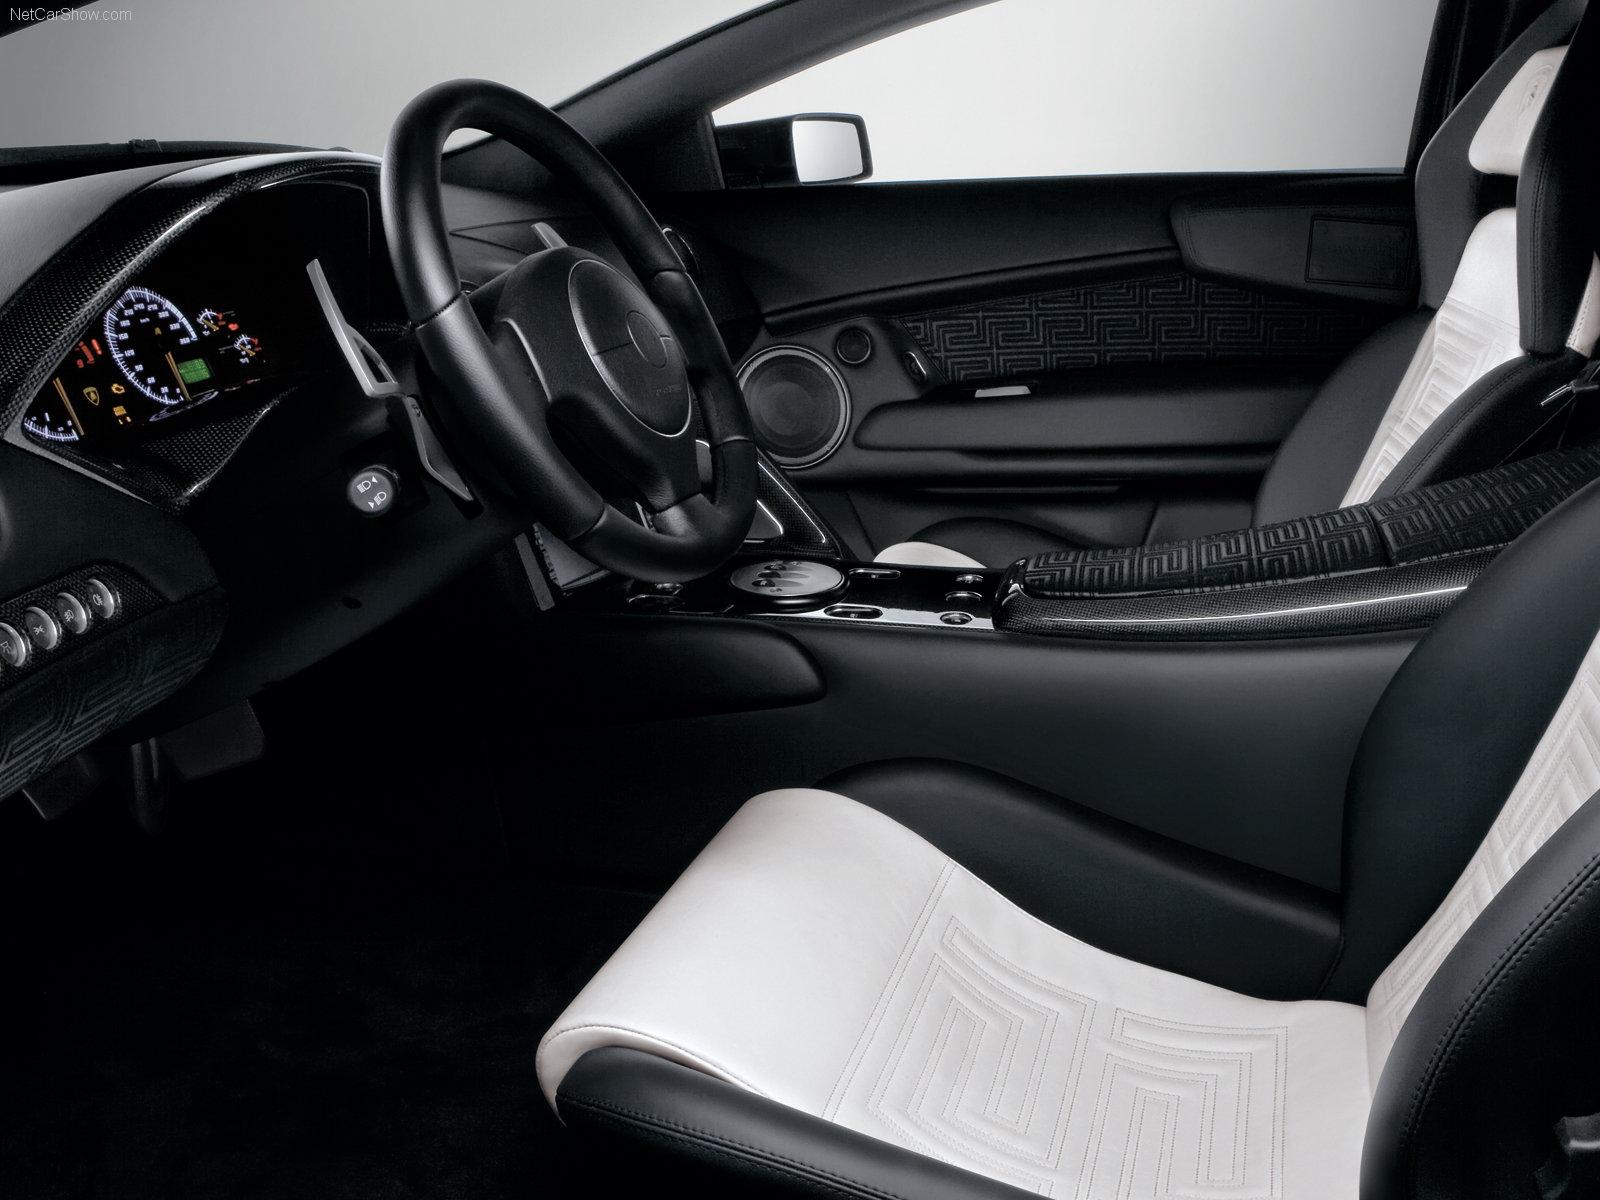 Hình ảnh siêu xe Lamborghini Murcielago LP640 Versace 2007 & nội ngoại thất